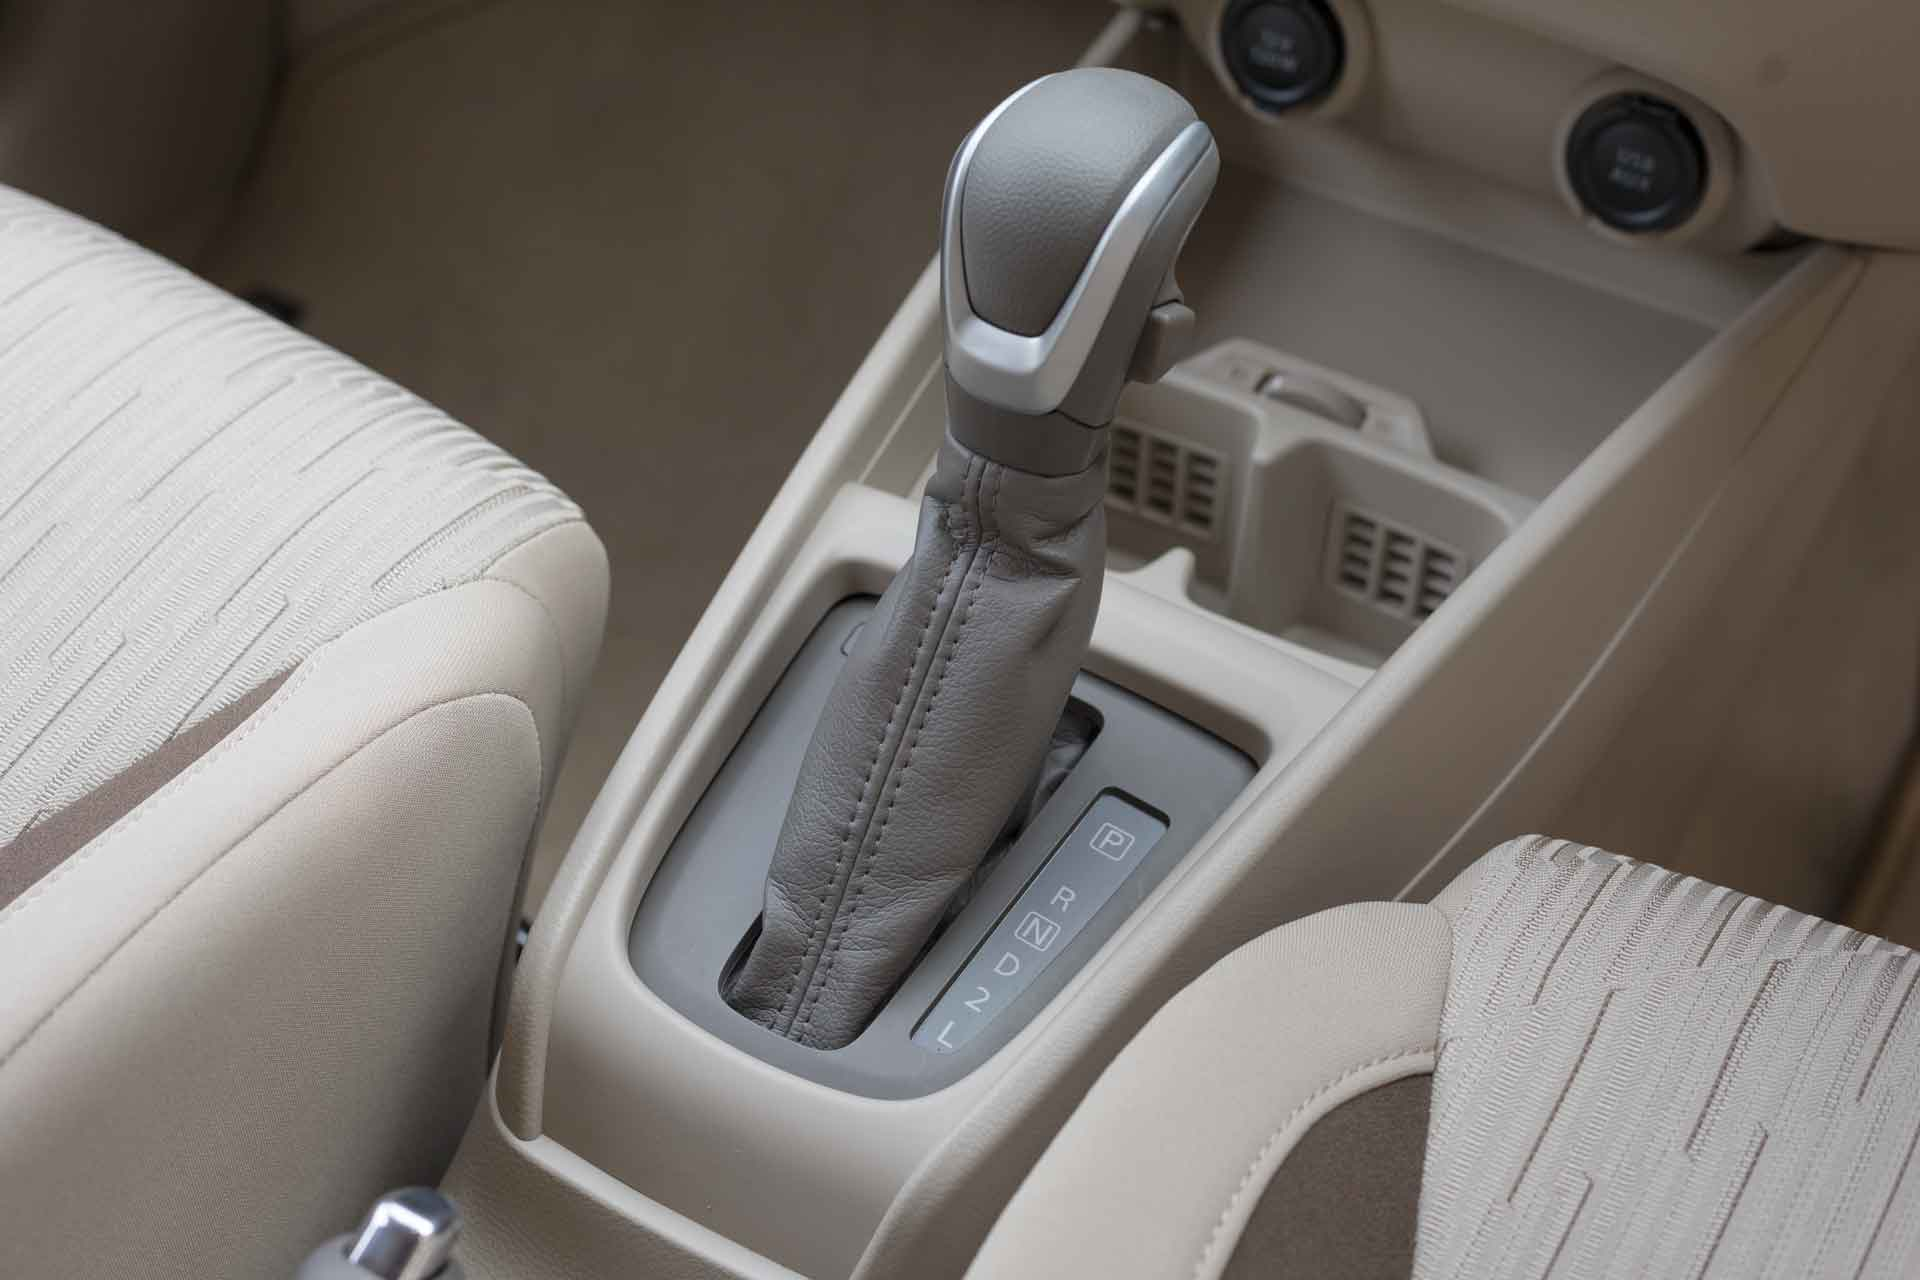 Maruti Suzuki Ertiga Automatic